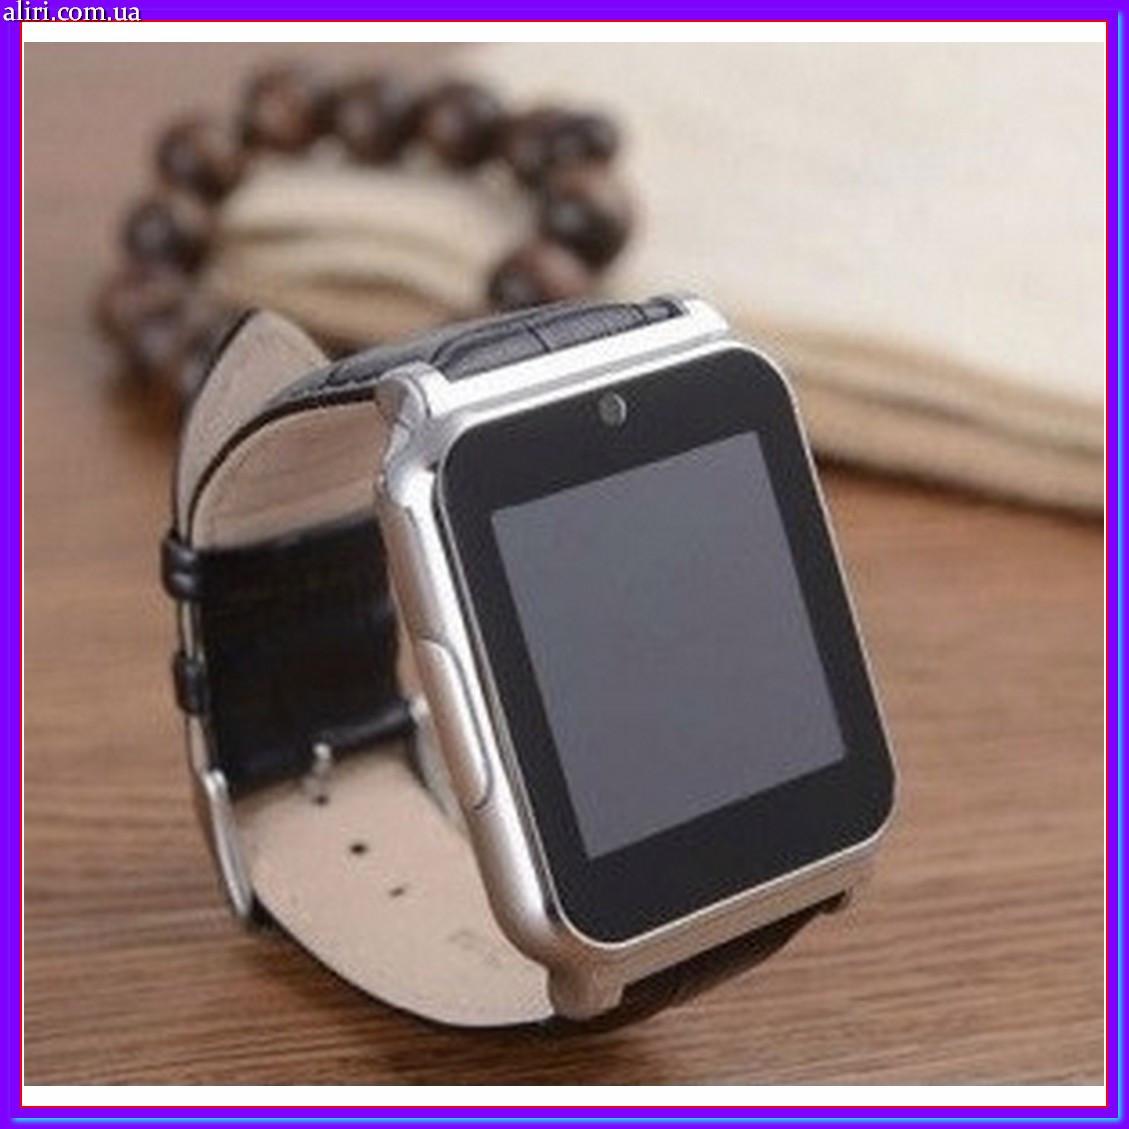 617a6b93fc6b Сенсорные Smart Watch W90 смарт часы умные часы Чёрные